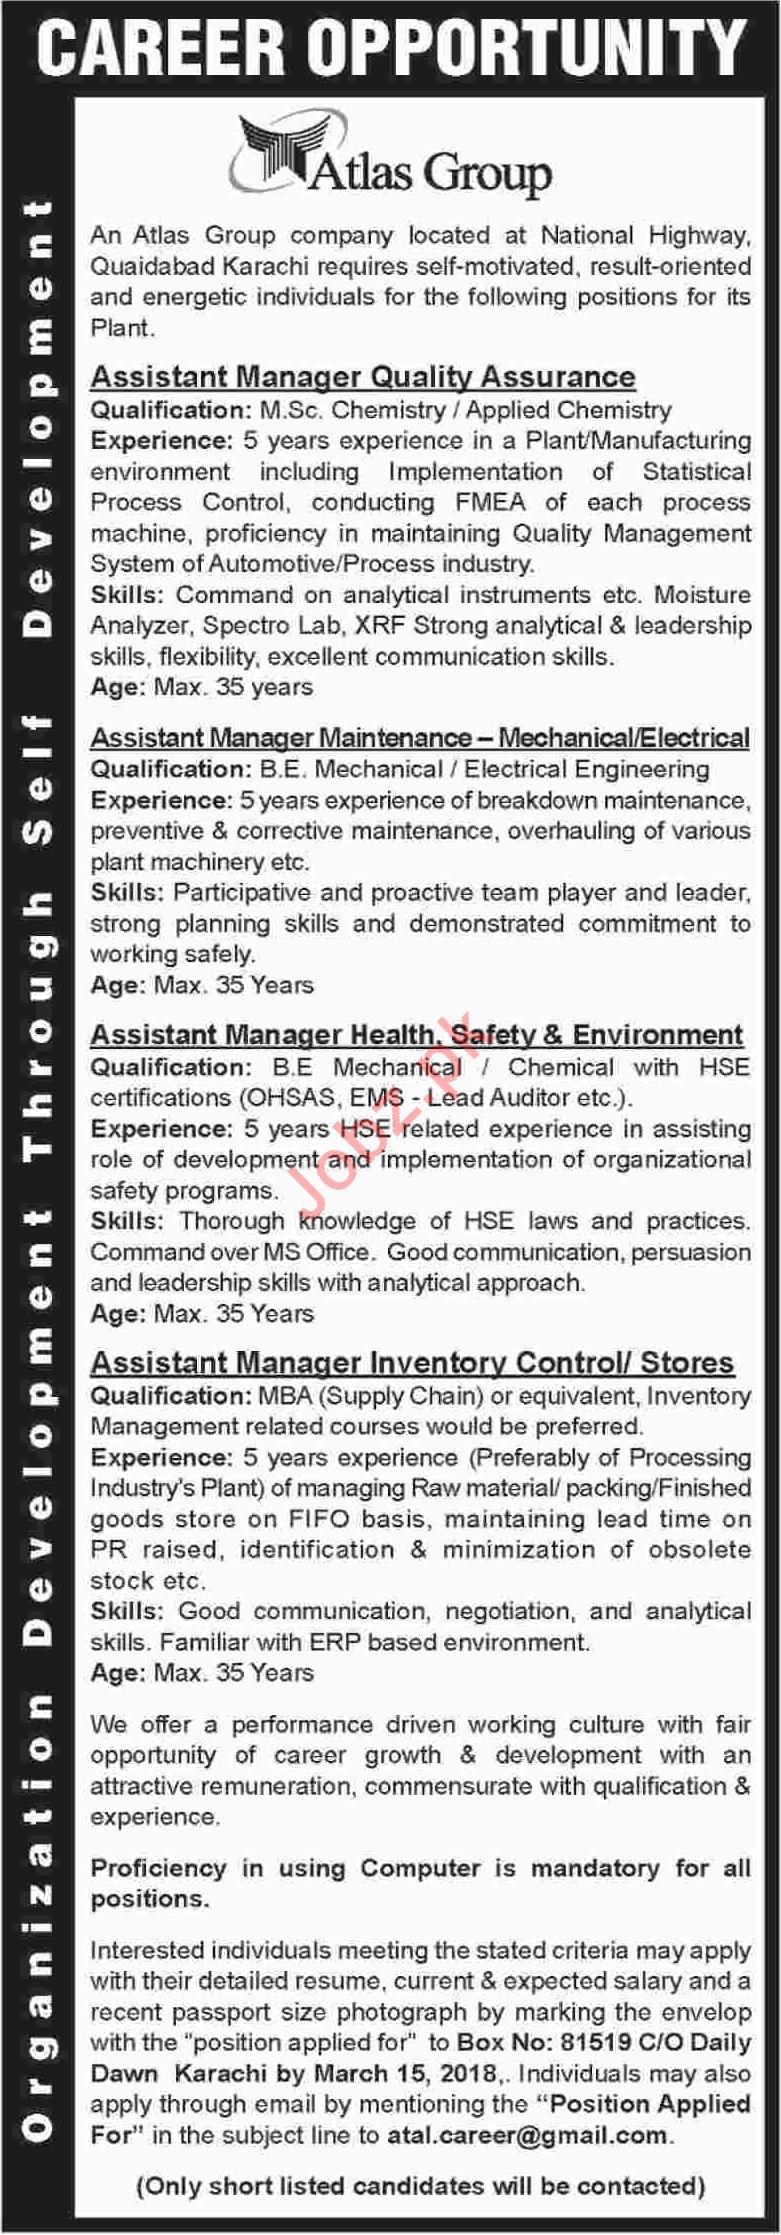 Atlas Group Karachi Jobs 2018 for Managers